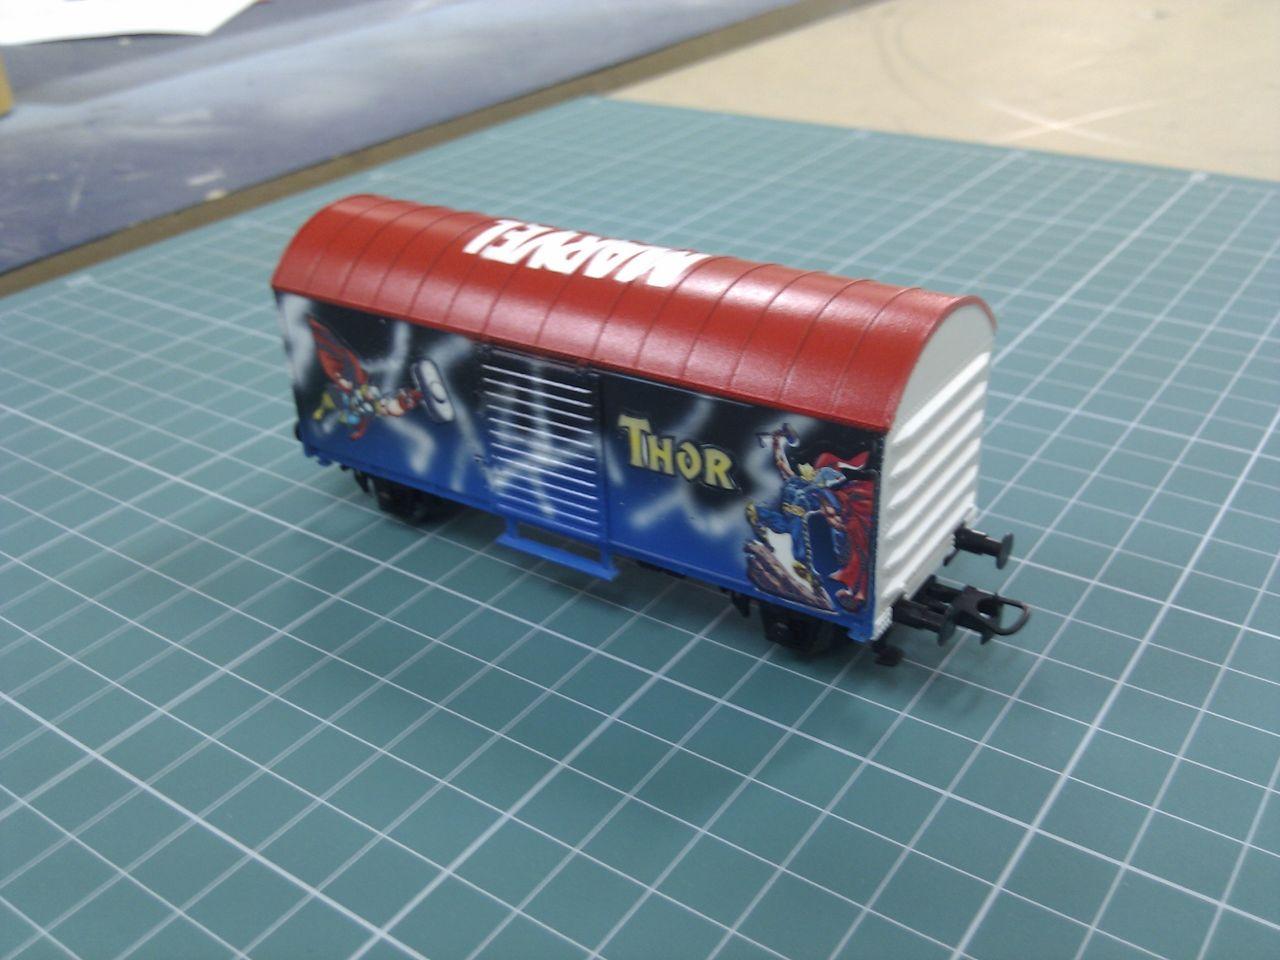 Vagón personalizado (marvel) custom wagon (marvel)